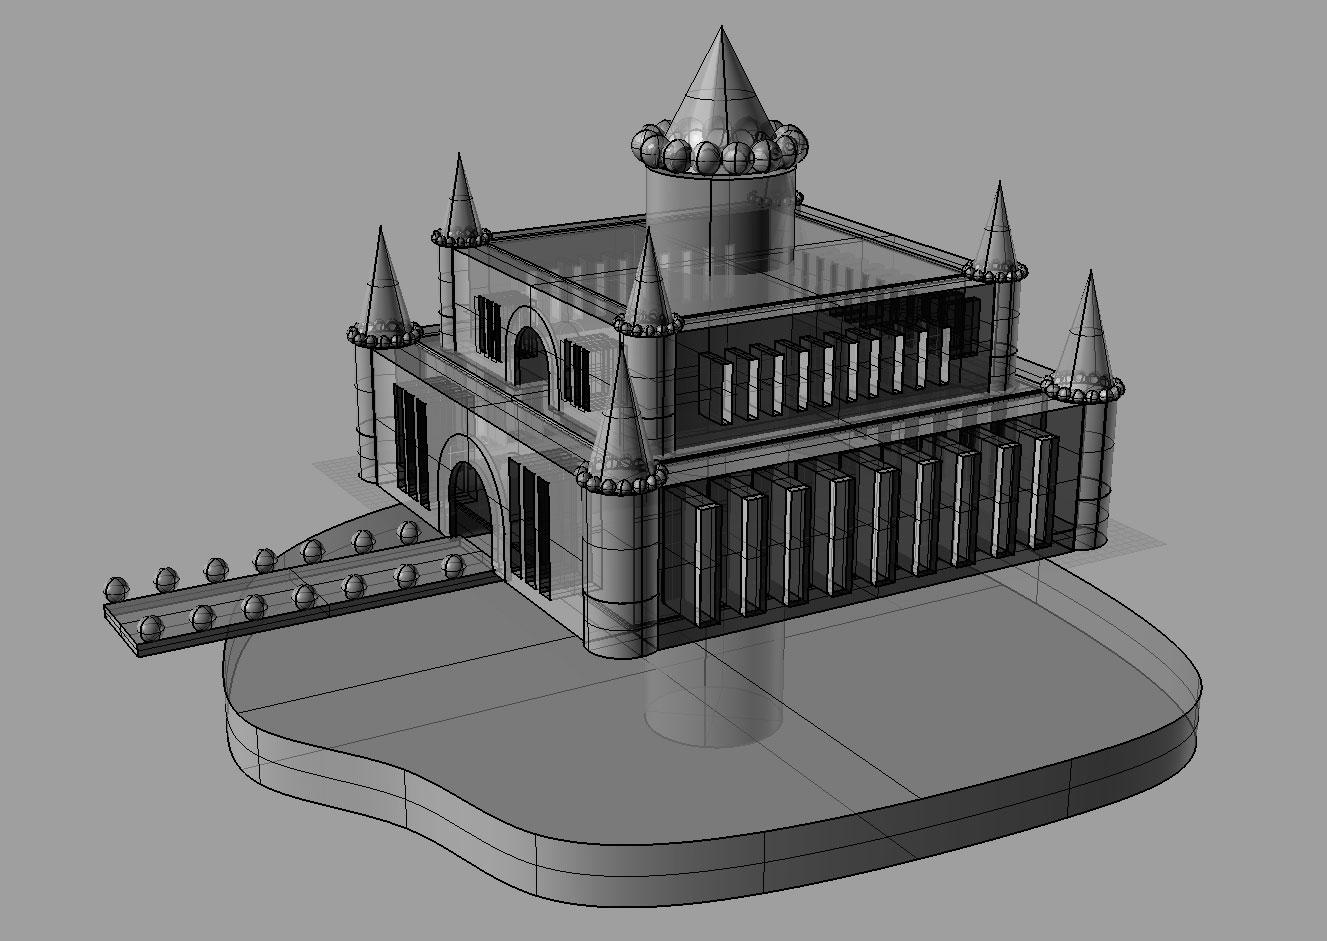 Elds 205 computer aided product design ximena quiros week 1 castle ximena quiros week 1 castle baditri Choice Image